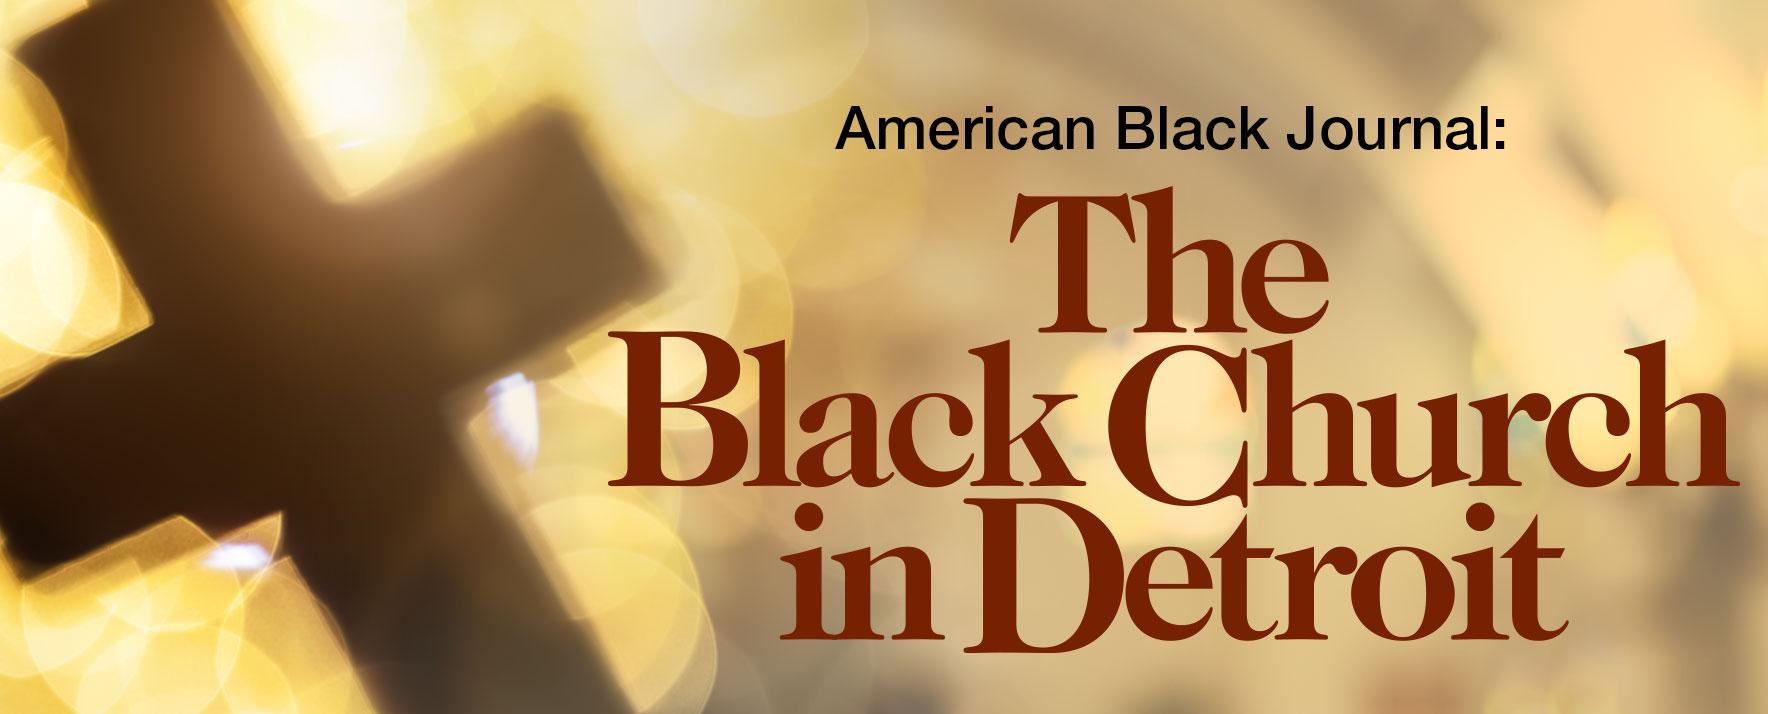 American Black Journal Black Church in Detroit logo